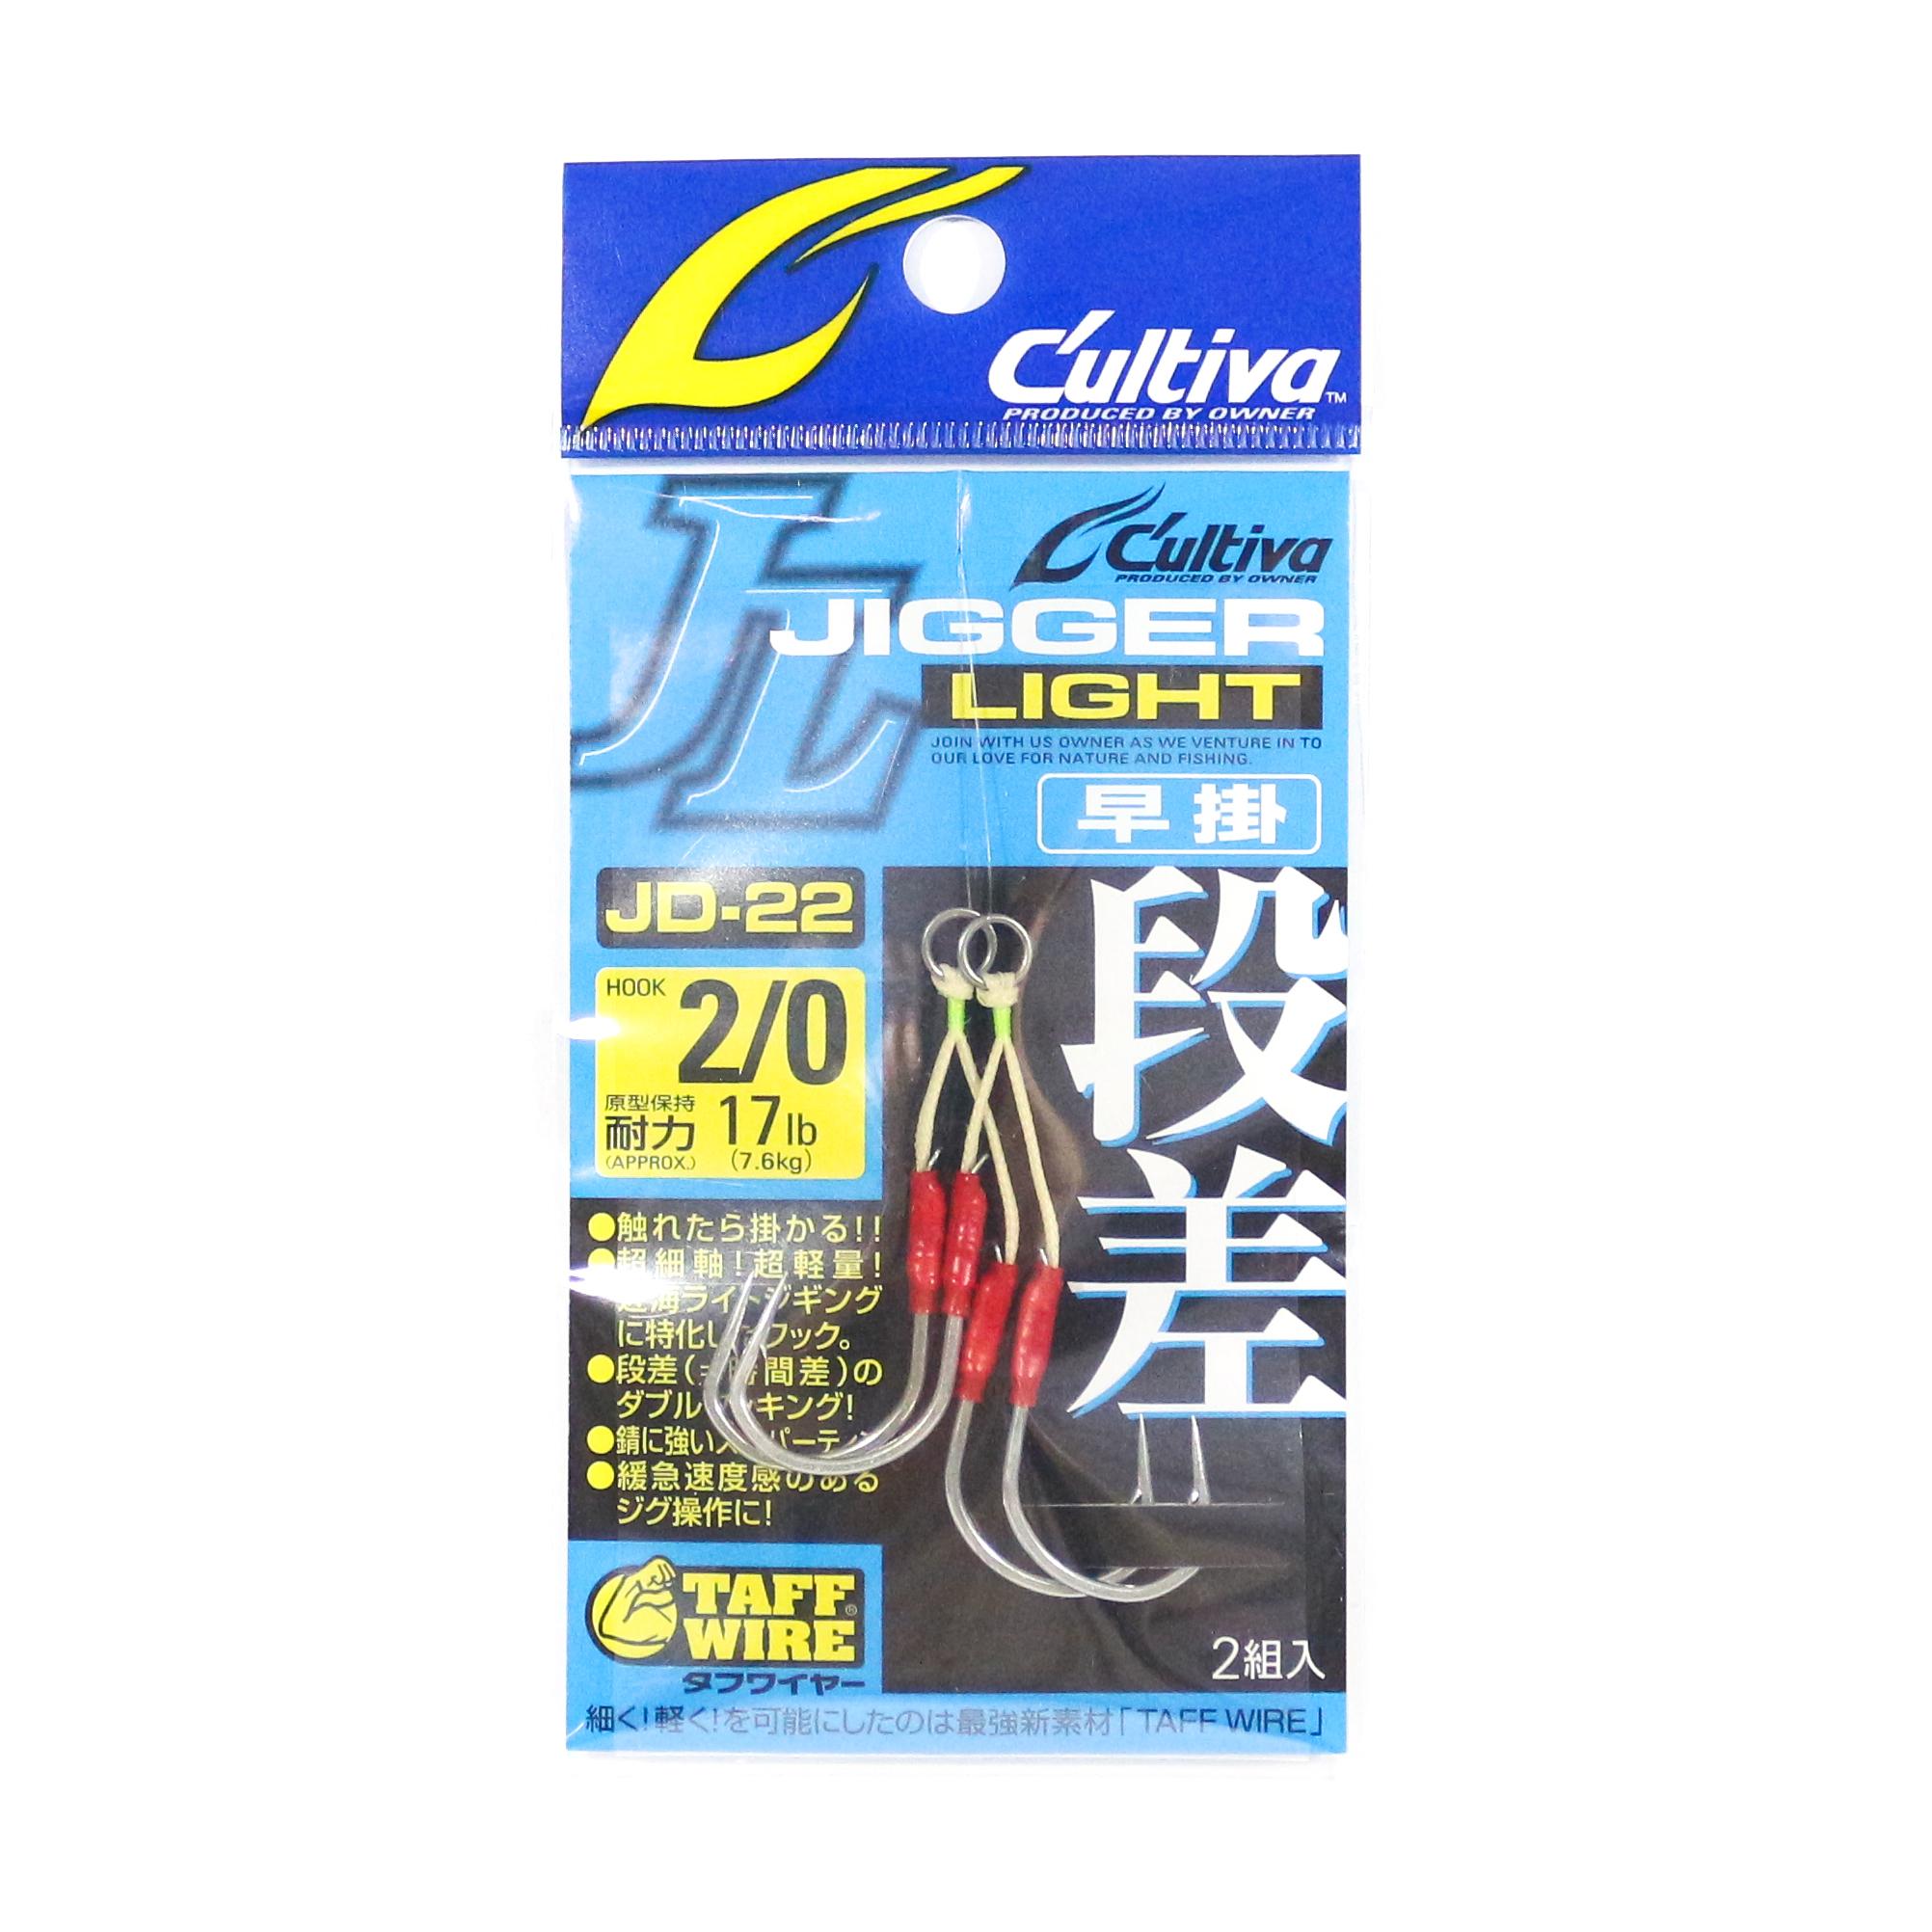 Owner JD-22 Jigger Light Twin Assist Hooks Size 2/0 (8863)